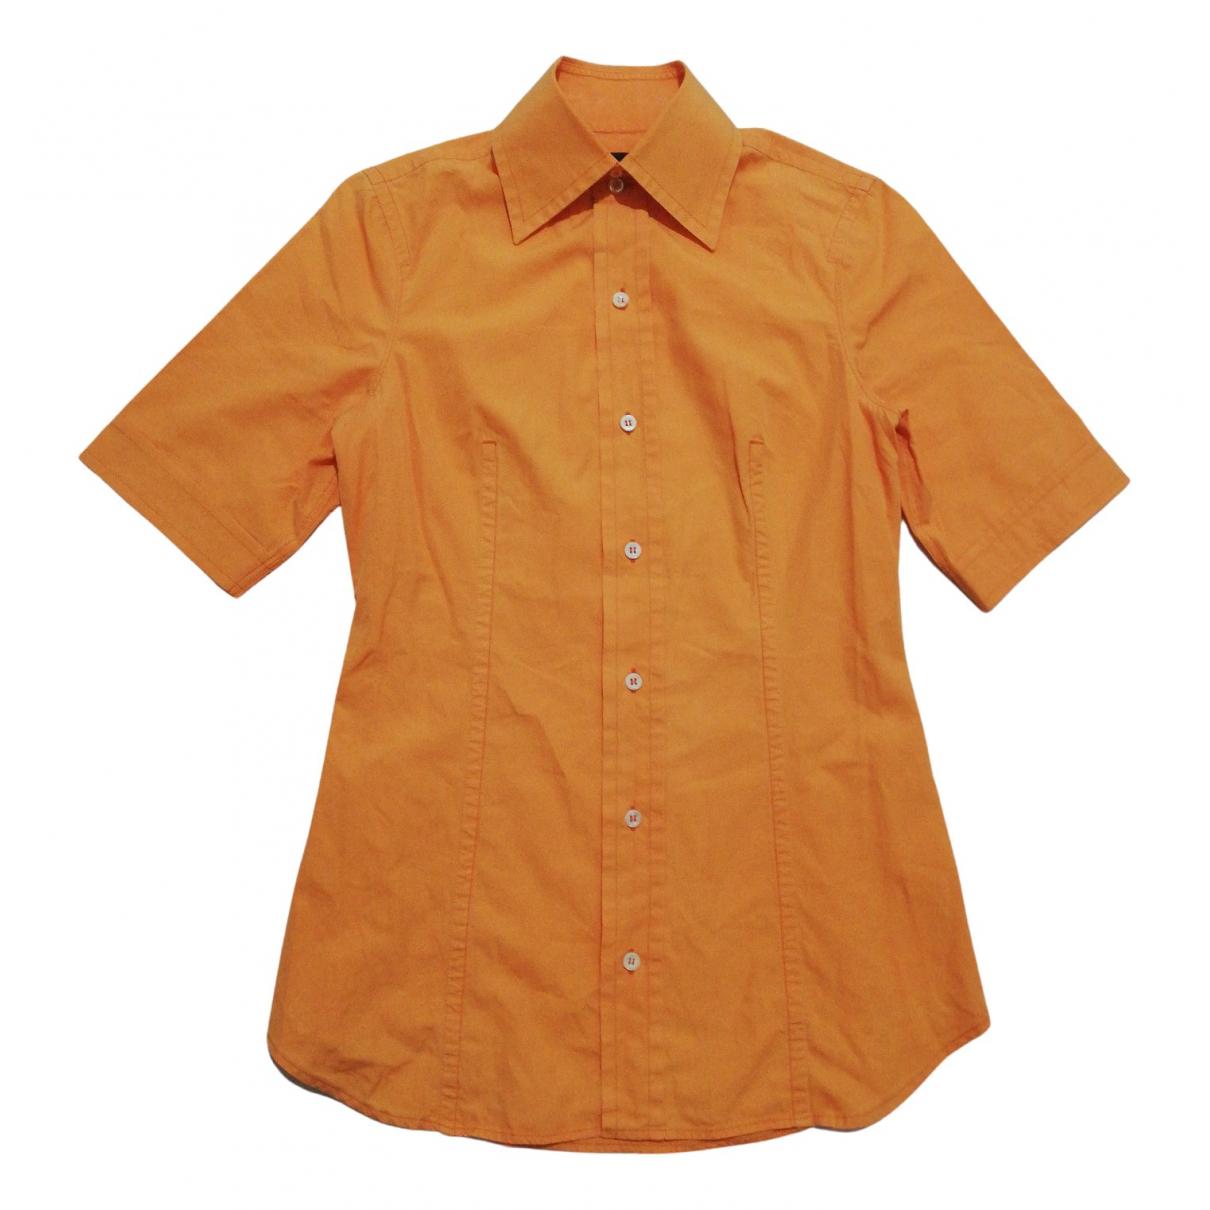 Dsquared2 N Orange Cotton Shirts for Men S International